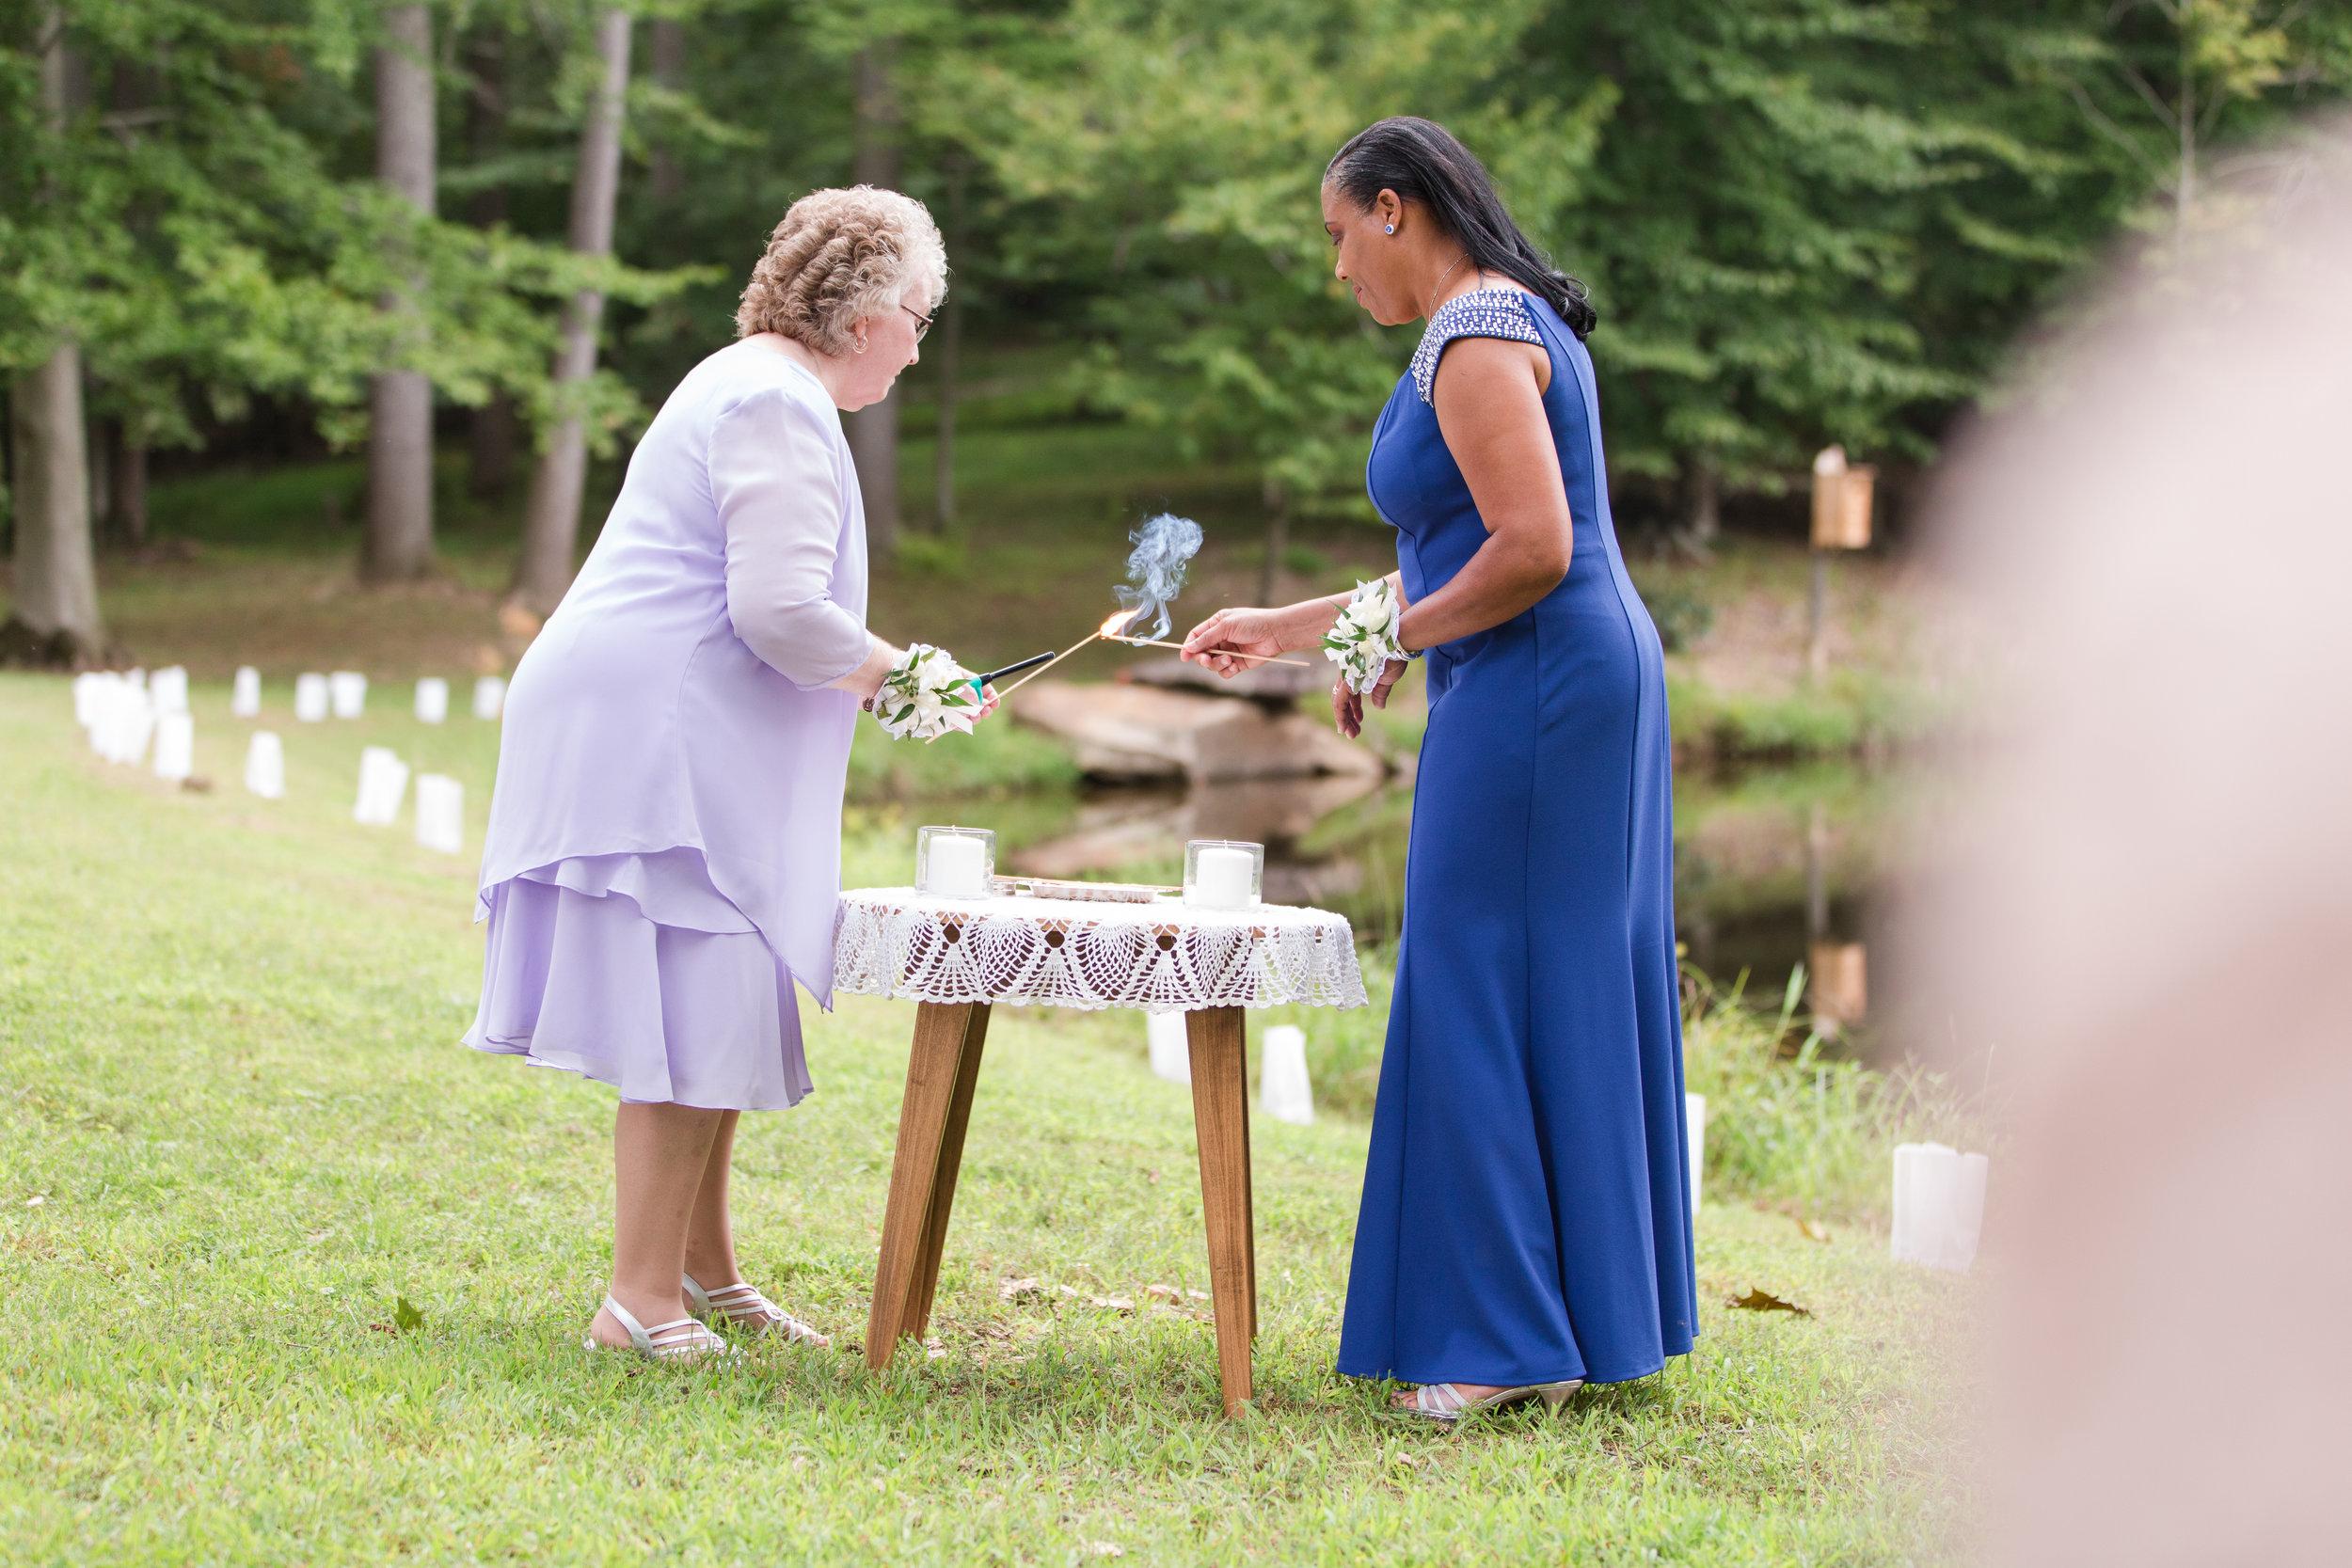 Garton-Demarco Wedding-Ceremony -6.jpg